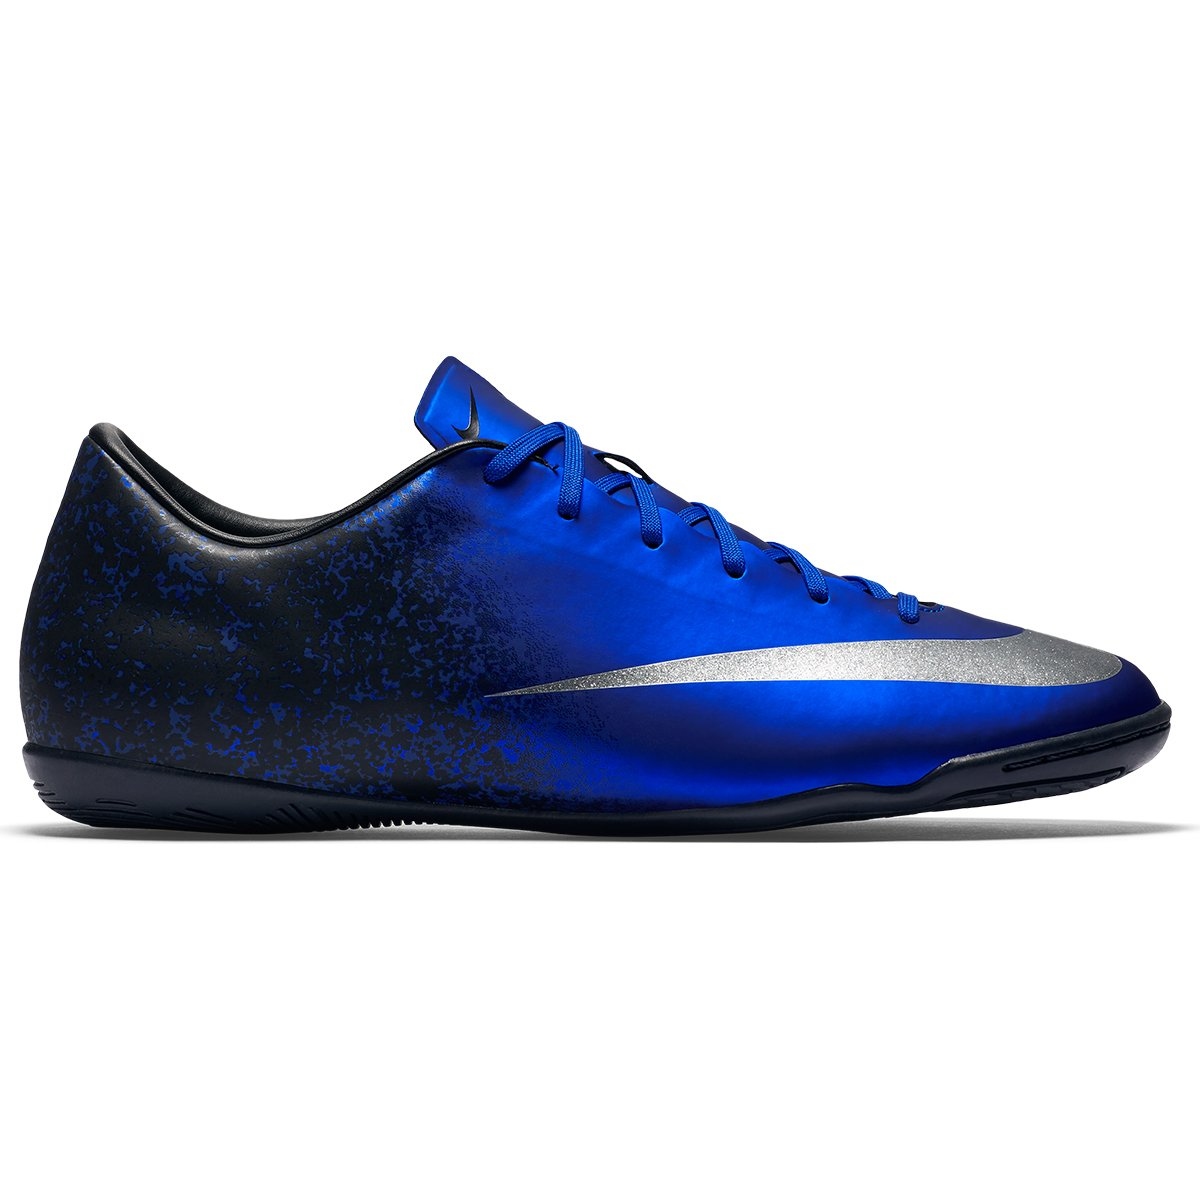 Chuteira Nike Mercurial Victory 5 CR7 IC Futsal - Compre Agora ... baab03e0ef707